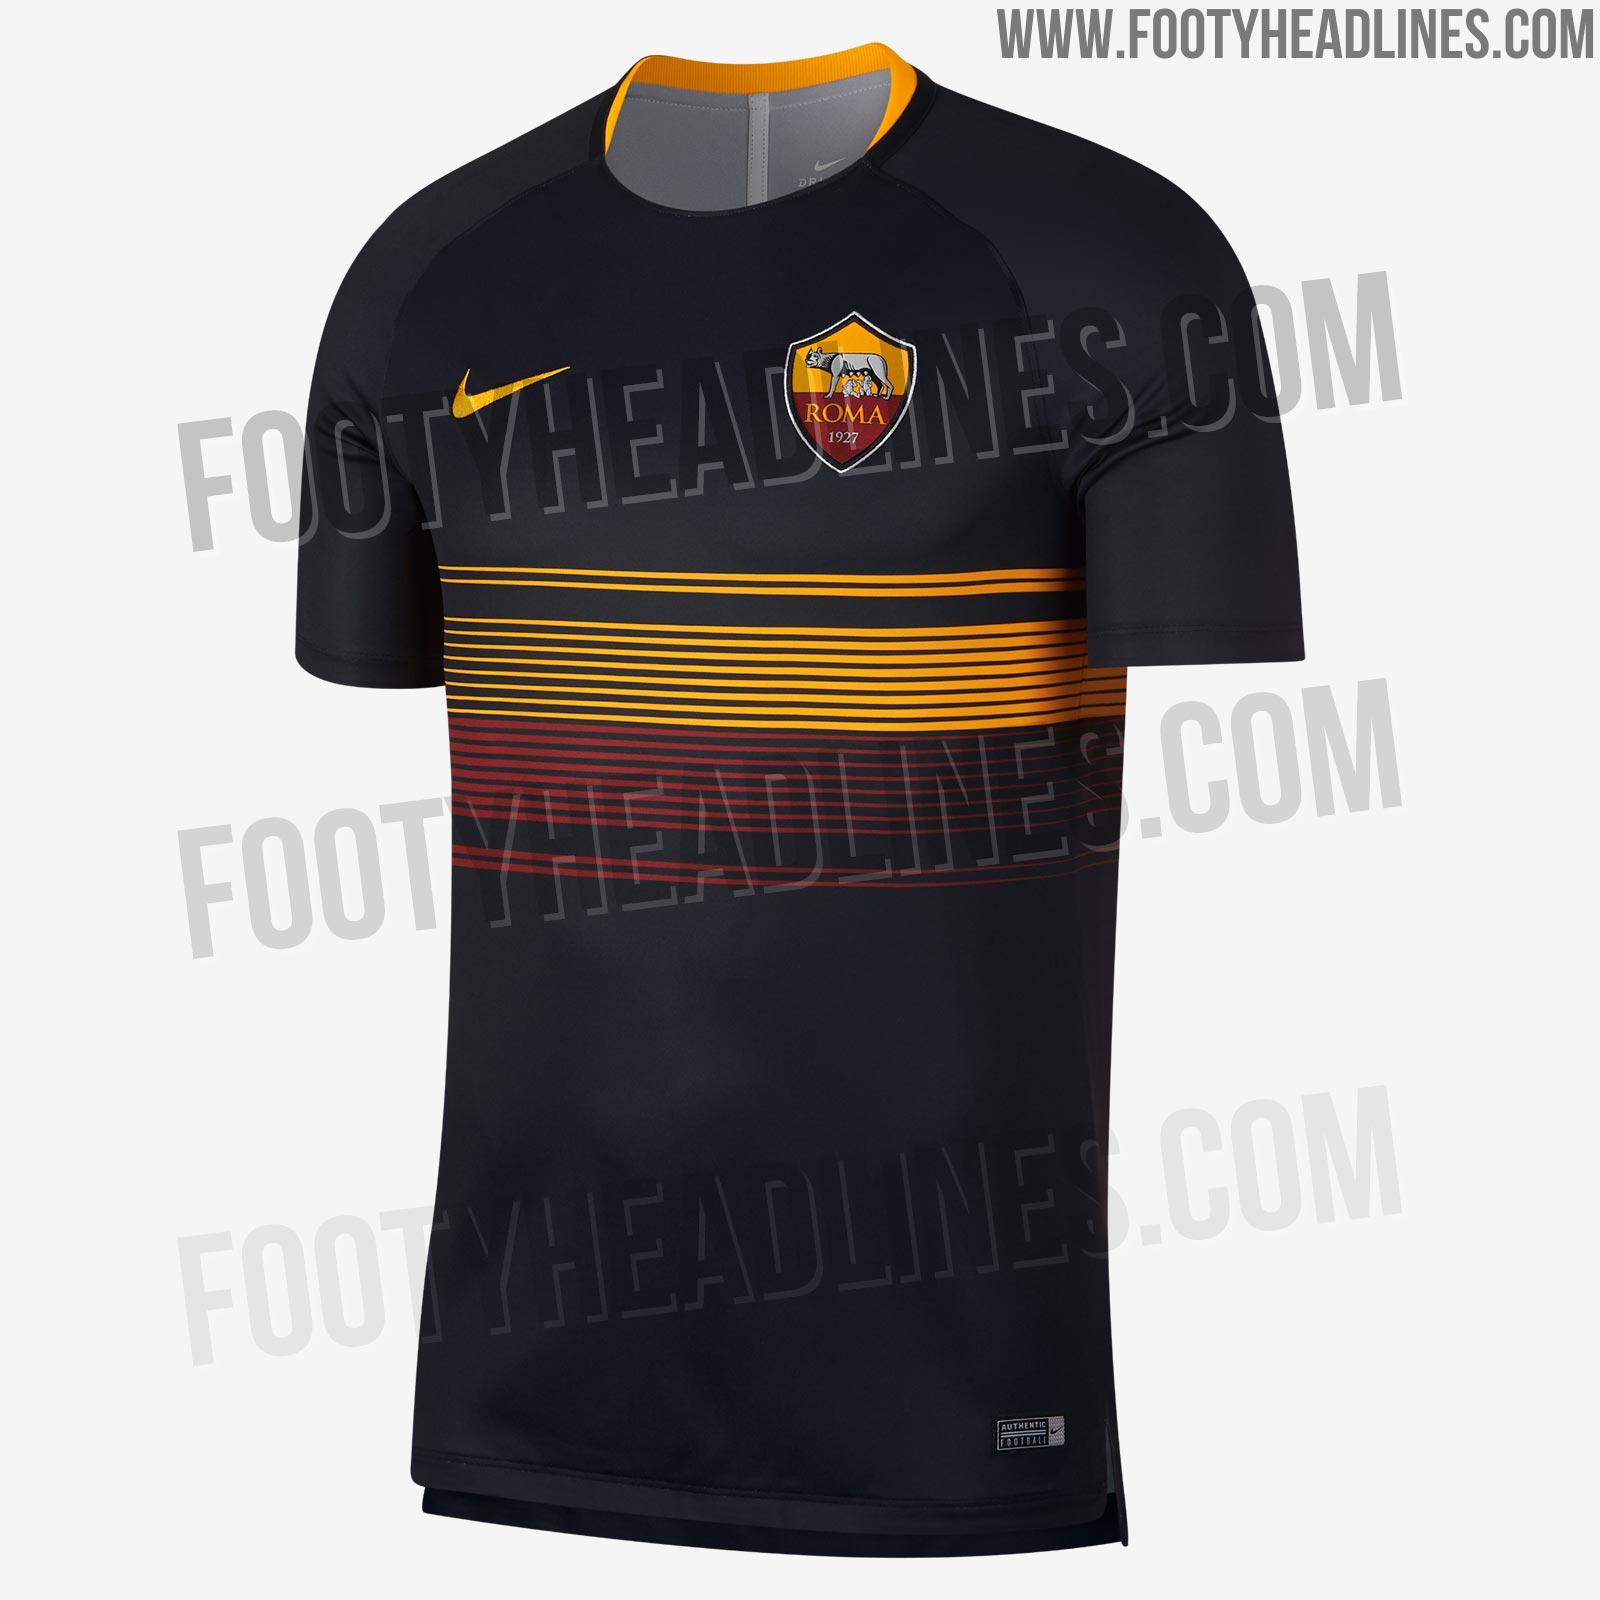 https://3.bp.blogspot.com/-2zqx-4nXszg/WmxXgAkeWuI/AAAAAAABaMM/_cEMwE5N92MfhX892YAmVhWZQQfY-J3LACLcBGAs/s1600/nike-as-roma-18-19-pre-match-shirt-1.jpg